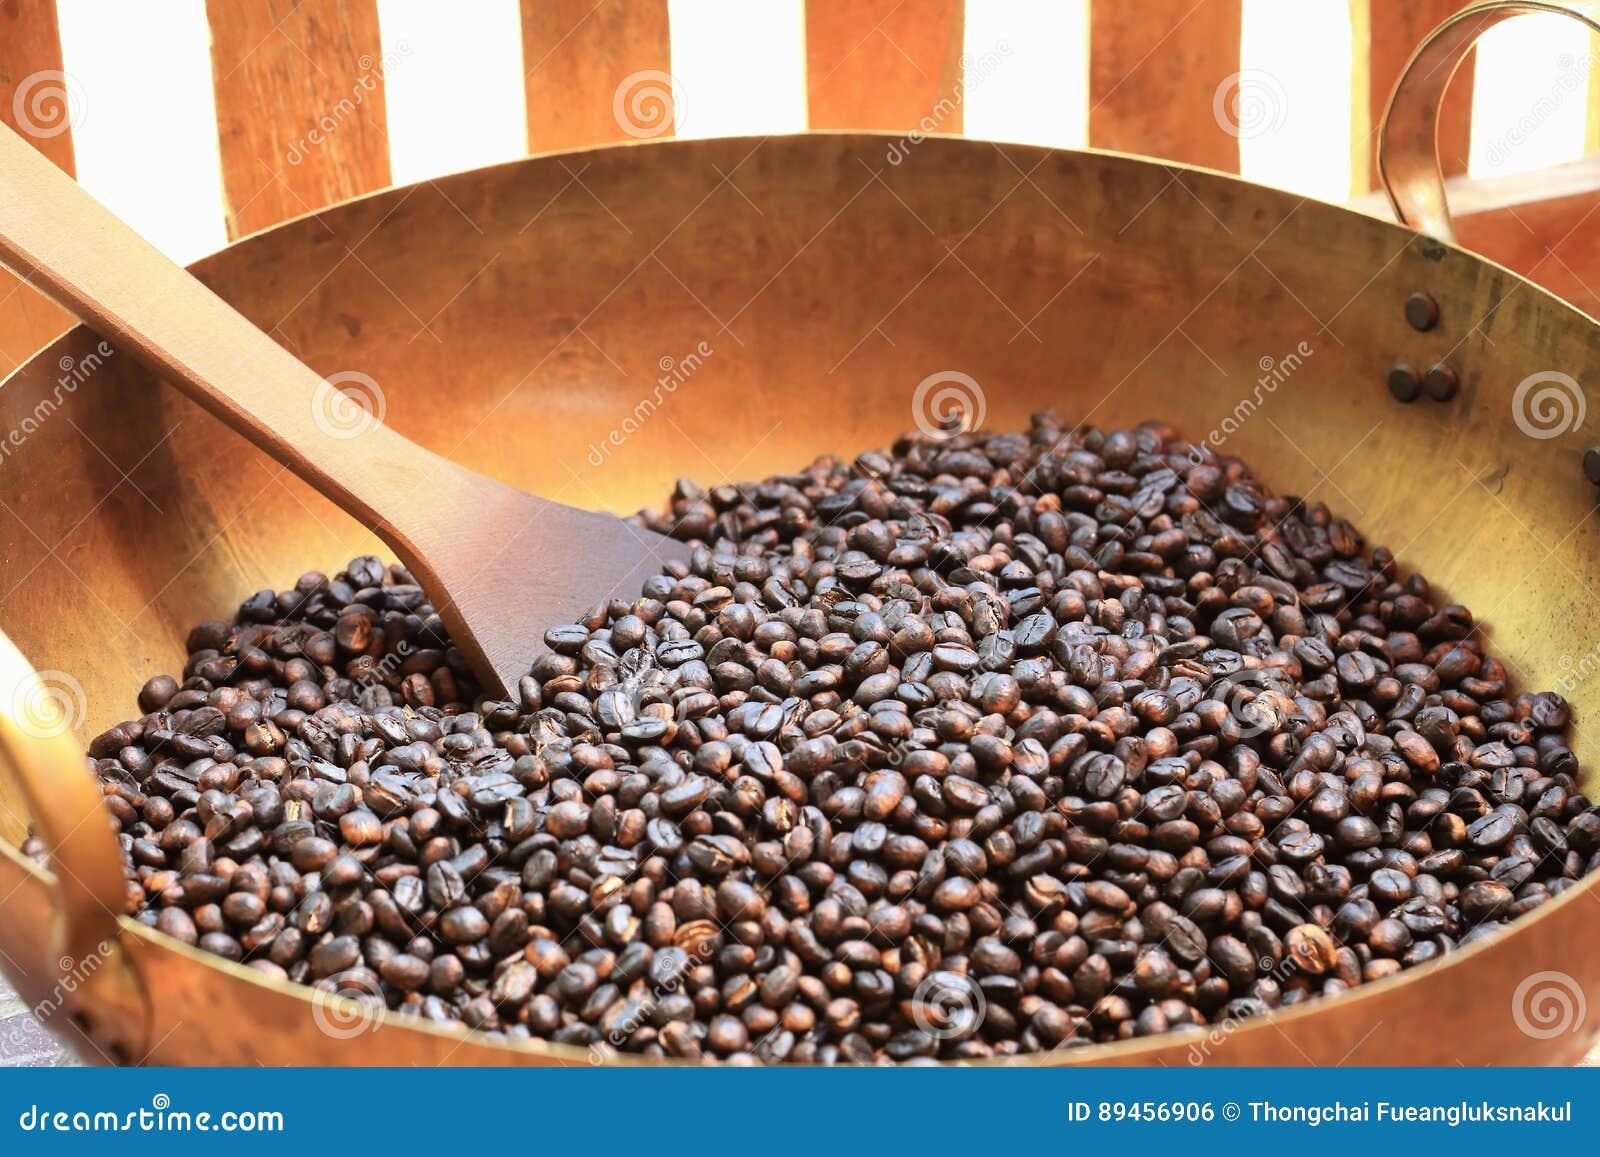 Traditionele koffiebonen die in metaalbassin roosteren met spatel